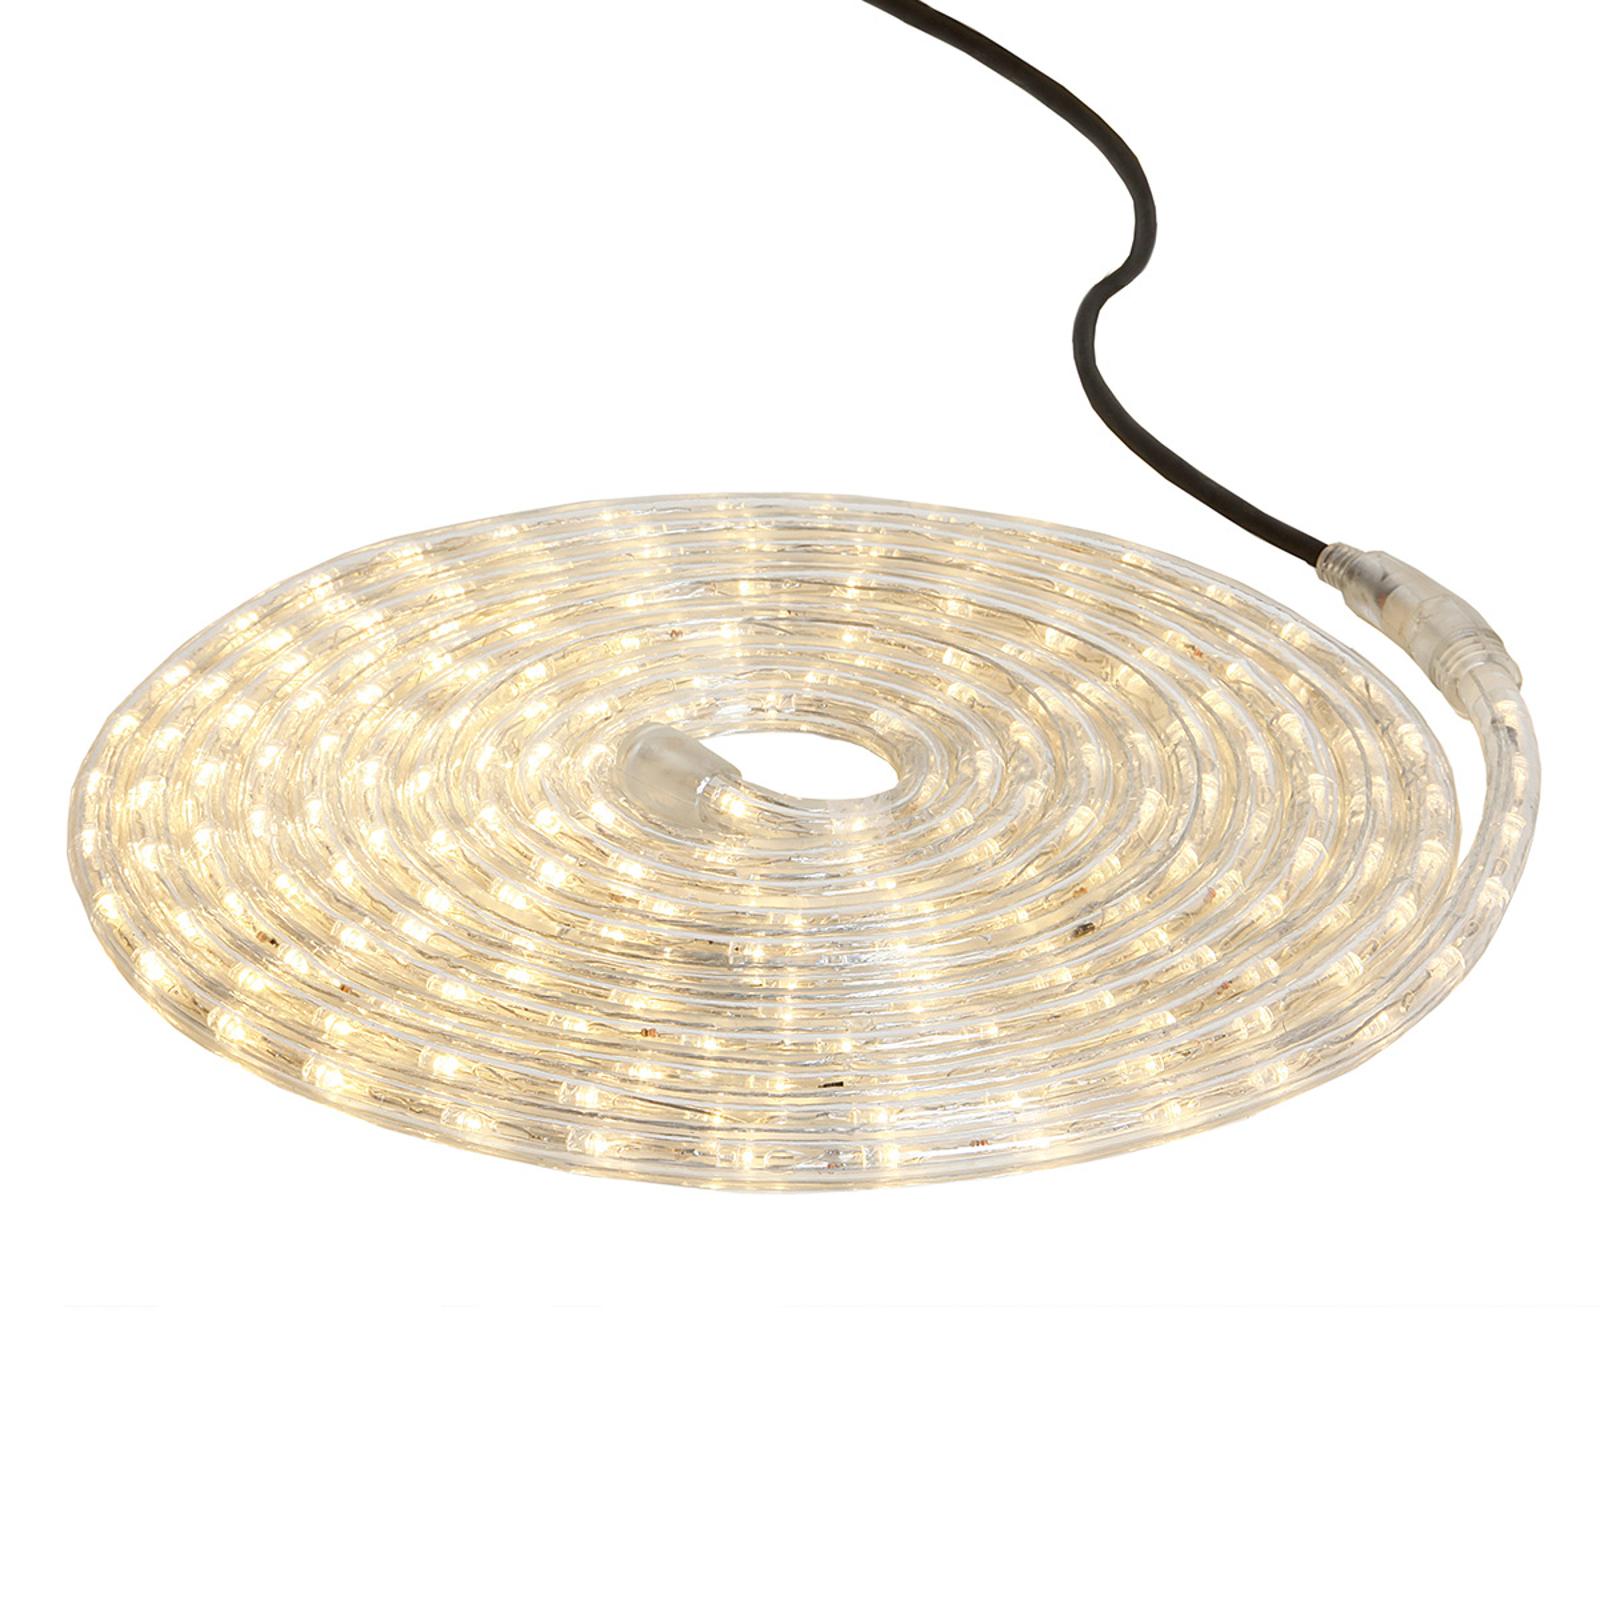 Ropelight Flex - 6 m lang LED-lysslange, varmhvit